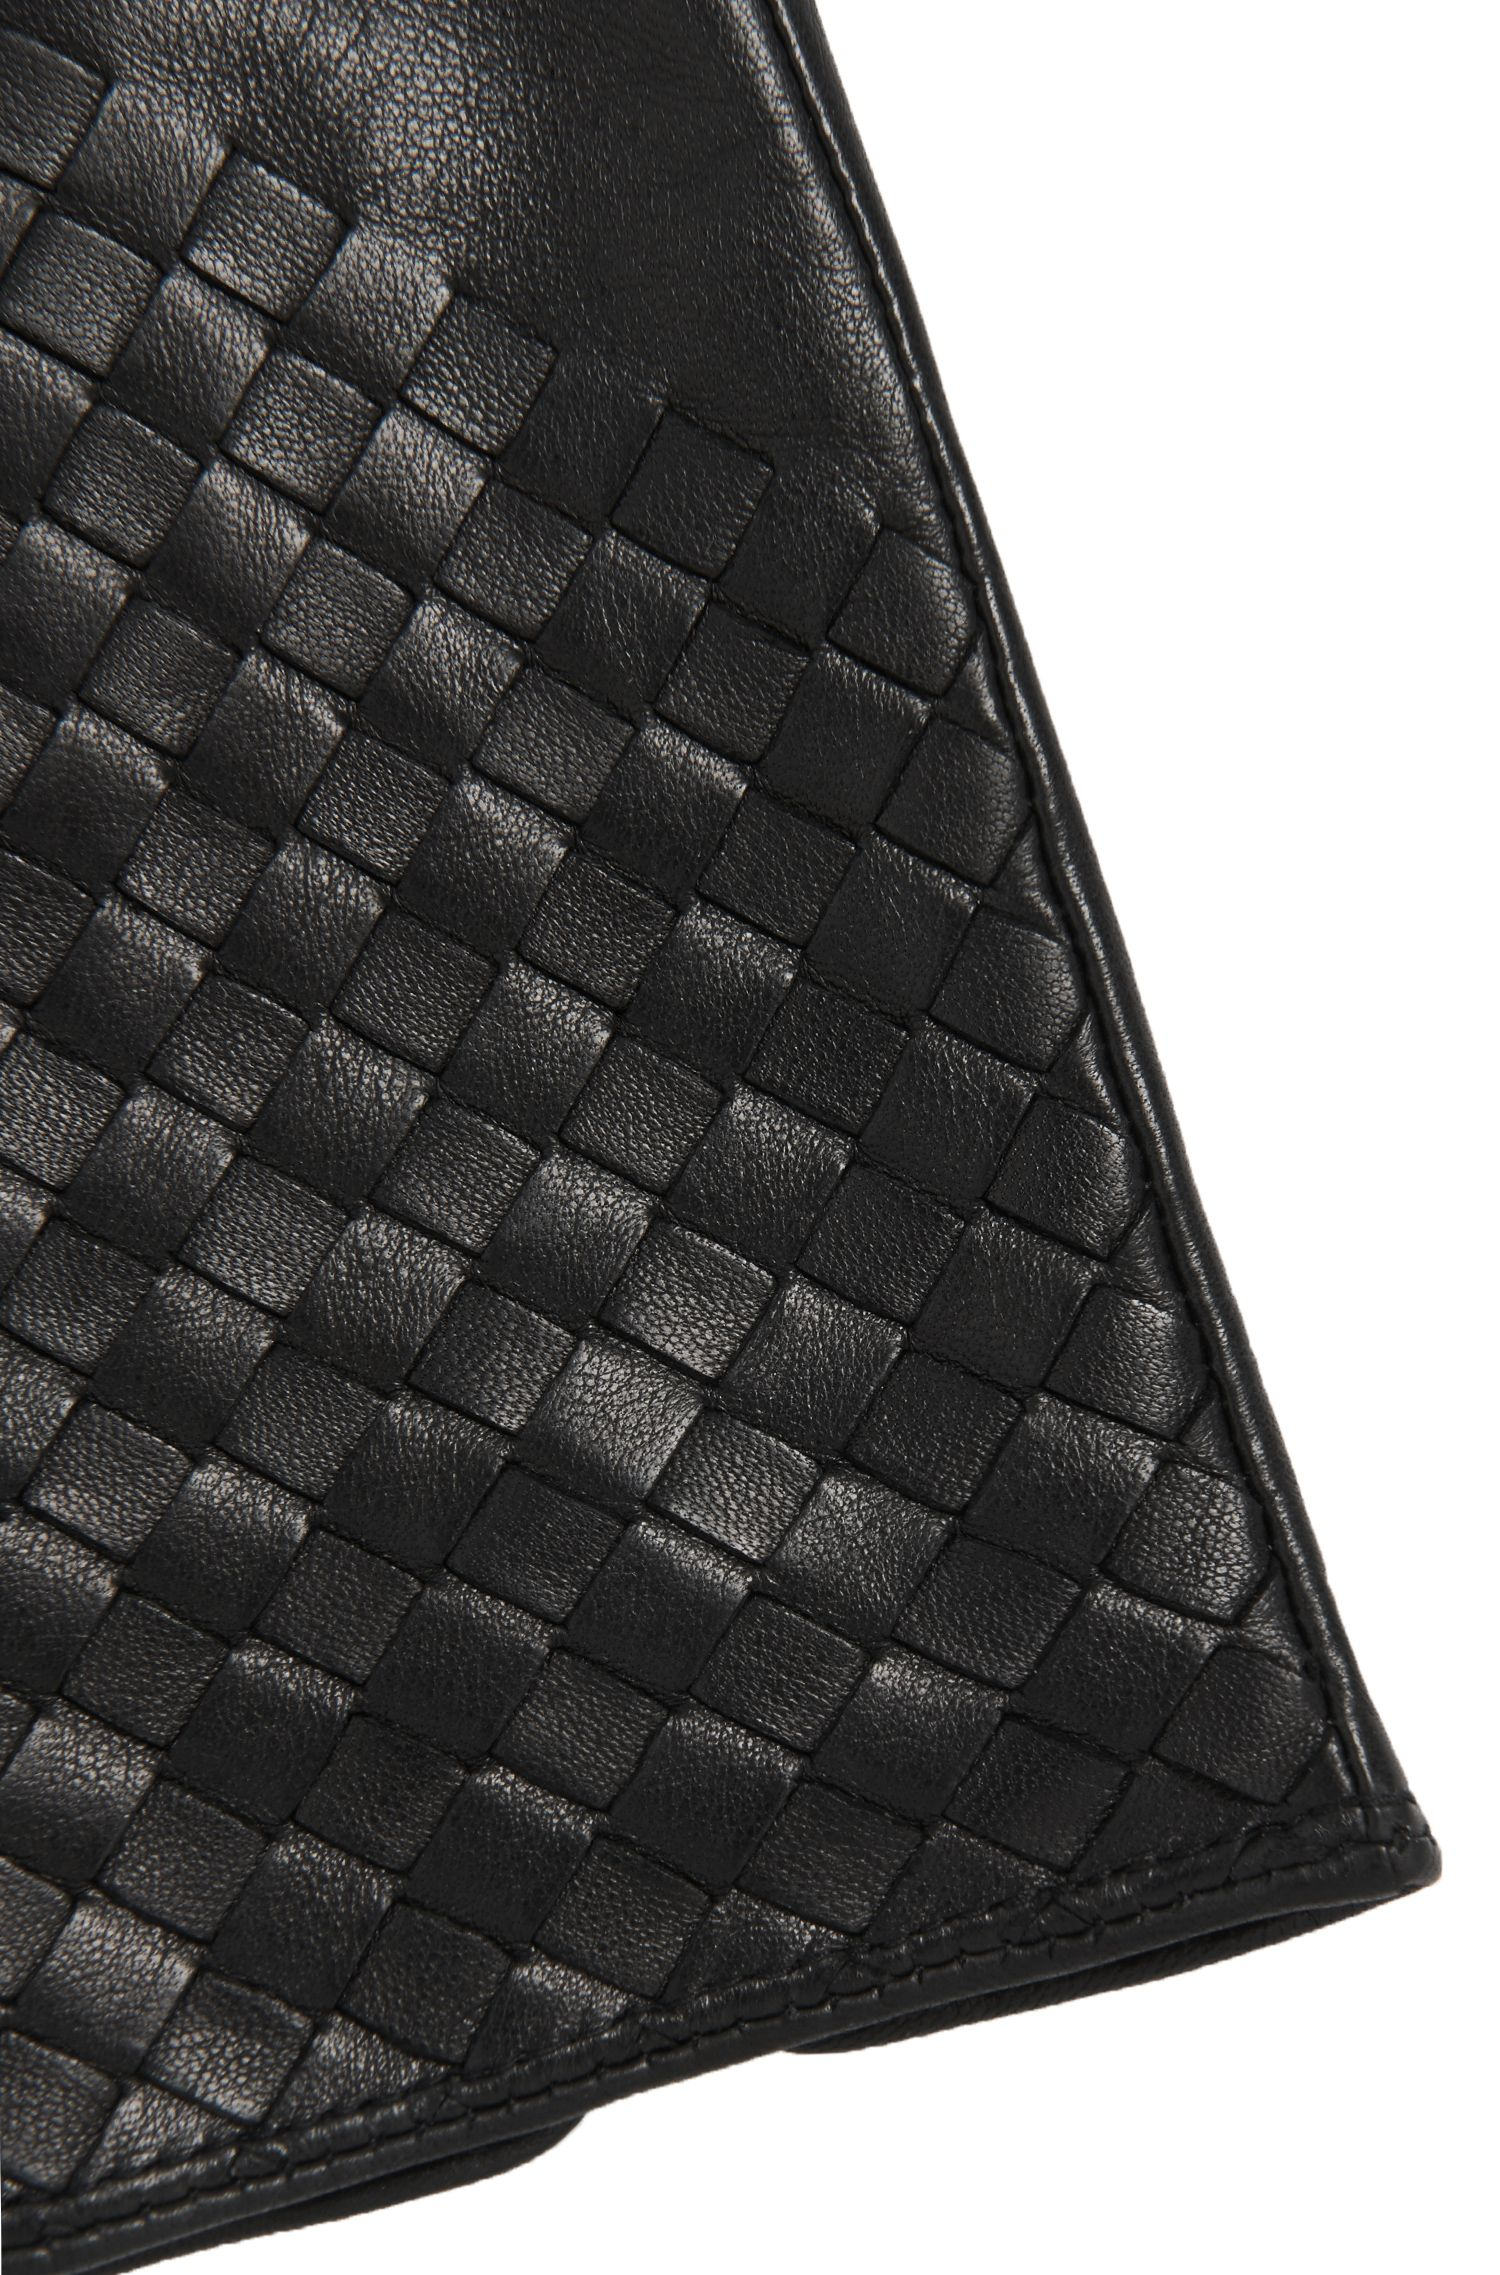 Handschuhe aus Leder mit Flecht-Details: 'Goory'